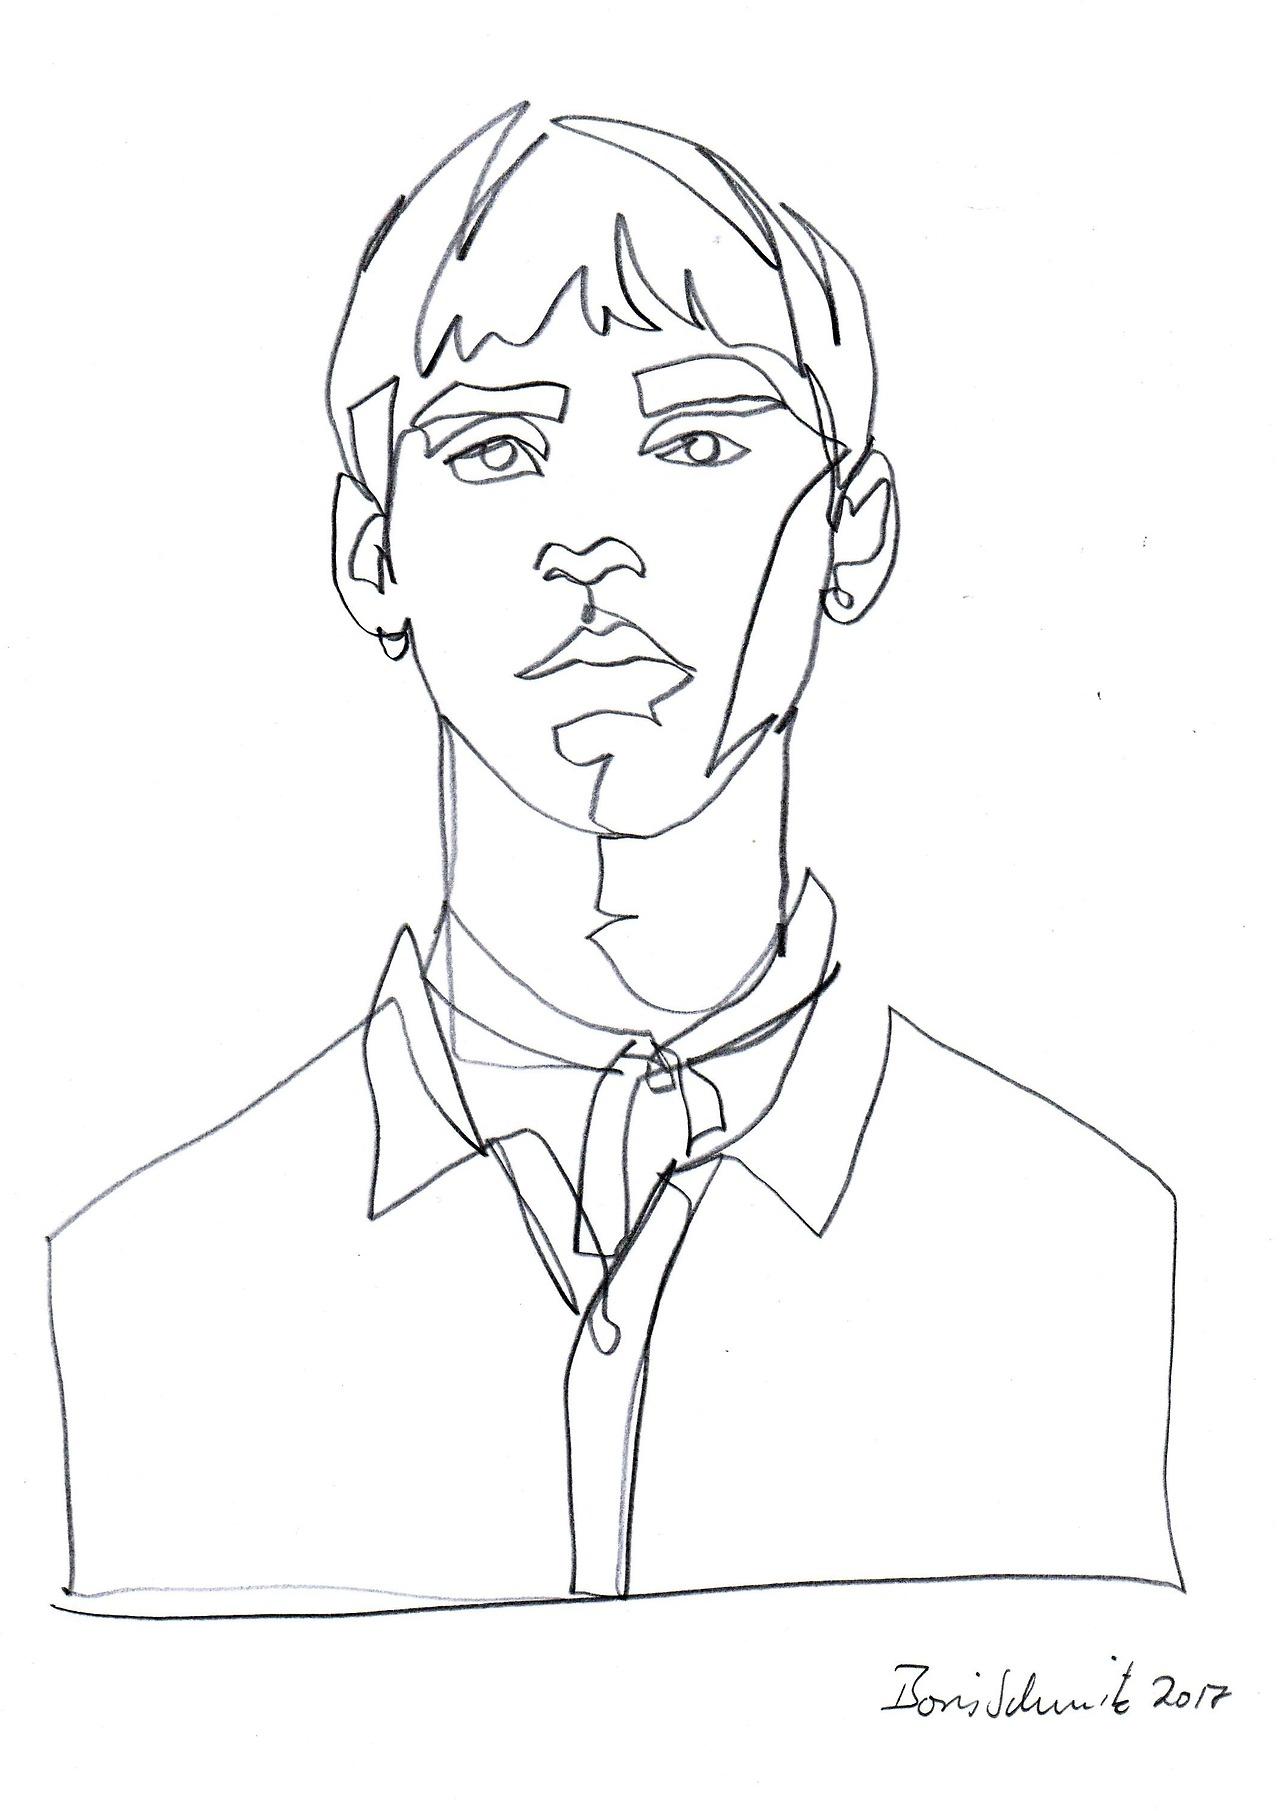 1280x1811 Boris Schmitz, 24 Years Old, Germany Drawing